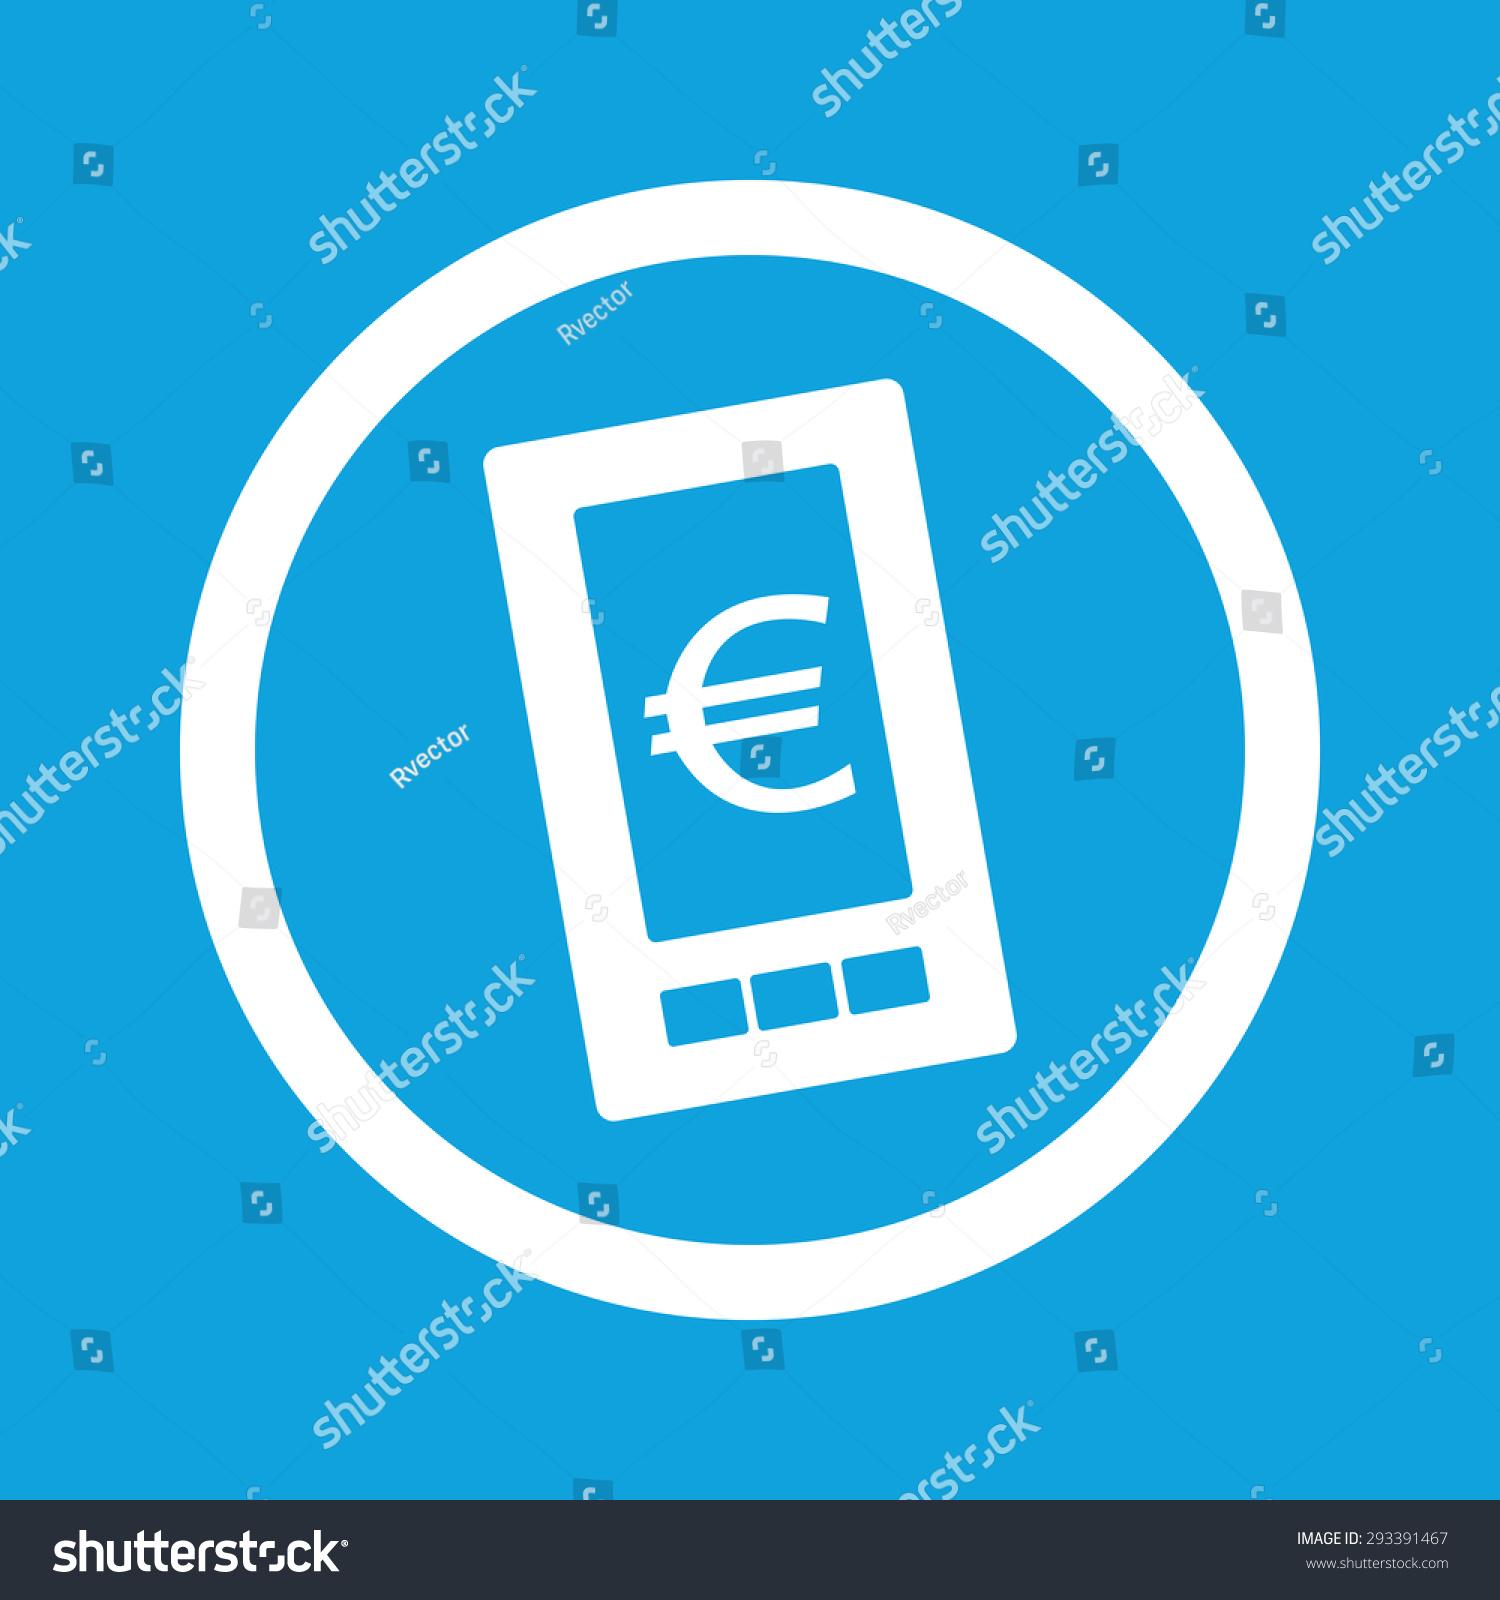 Royalty Free Stock Illustration Of Image Euro Symbol On Phone Screen